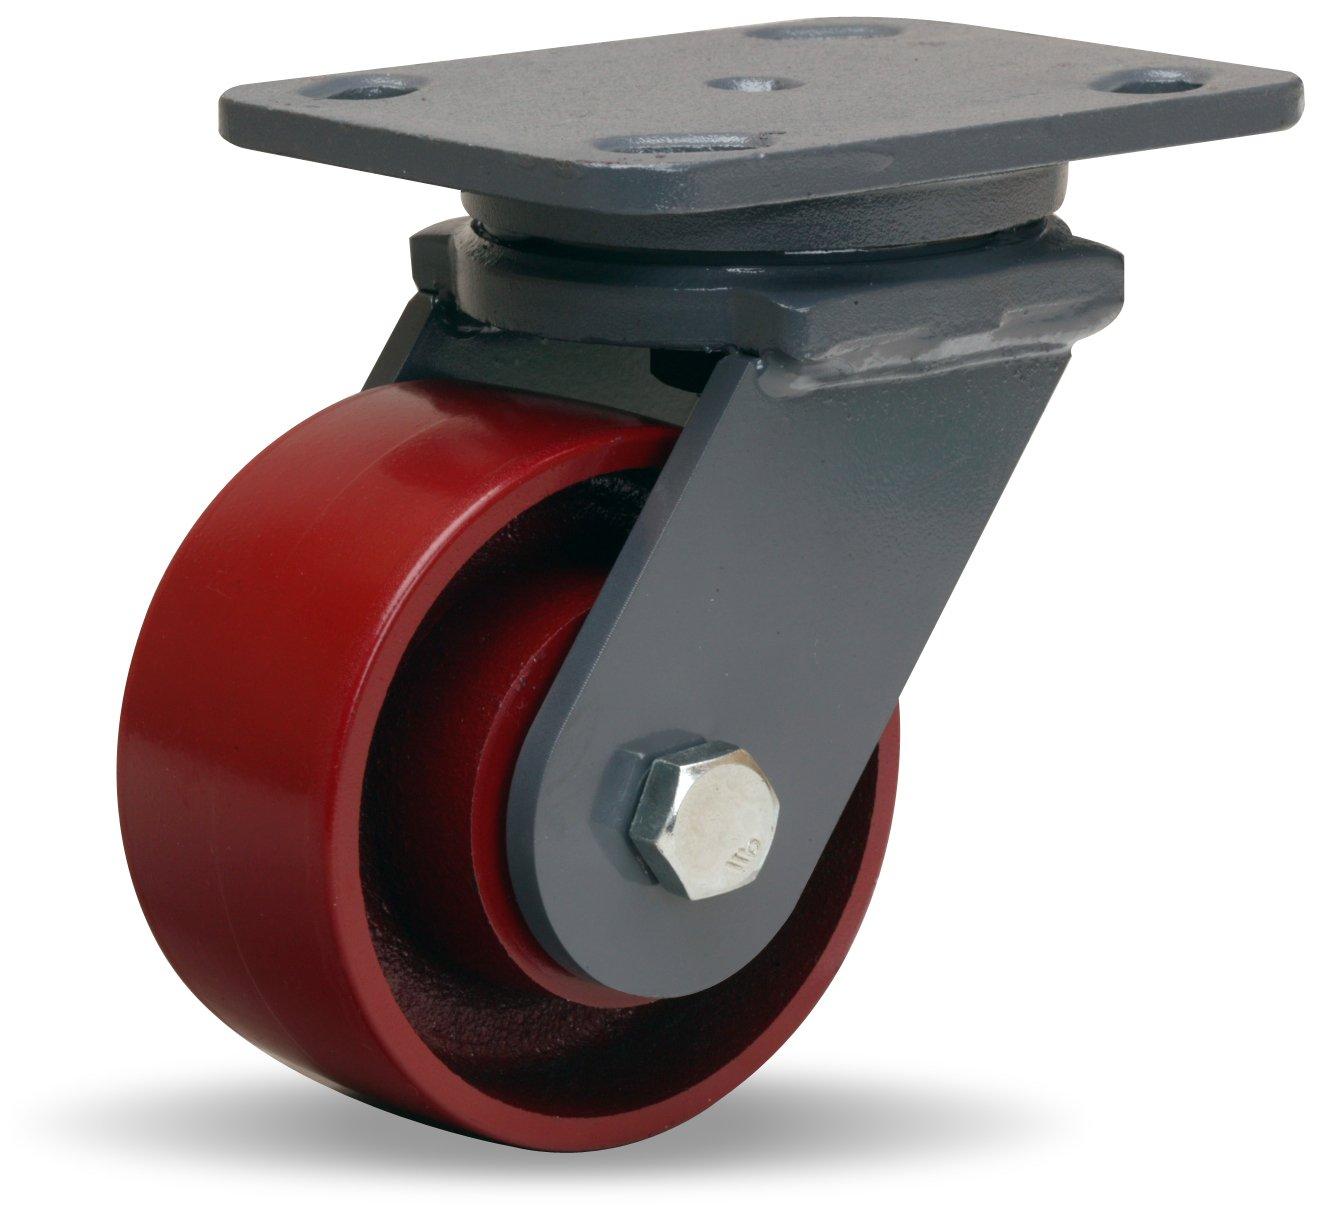 Hamilton Workhorse Plate Caster, Swivel, Metal Wheel, Precision Ball Bearing, 1000 lbs Capacity, 4'' Wheel Dia, 2'' Wheel Width, 5-5/8'' Mount Height, 5'' Plate Length, 4'' Plate Width